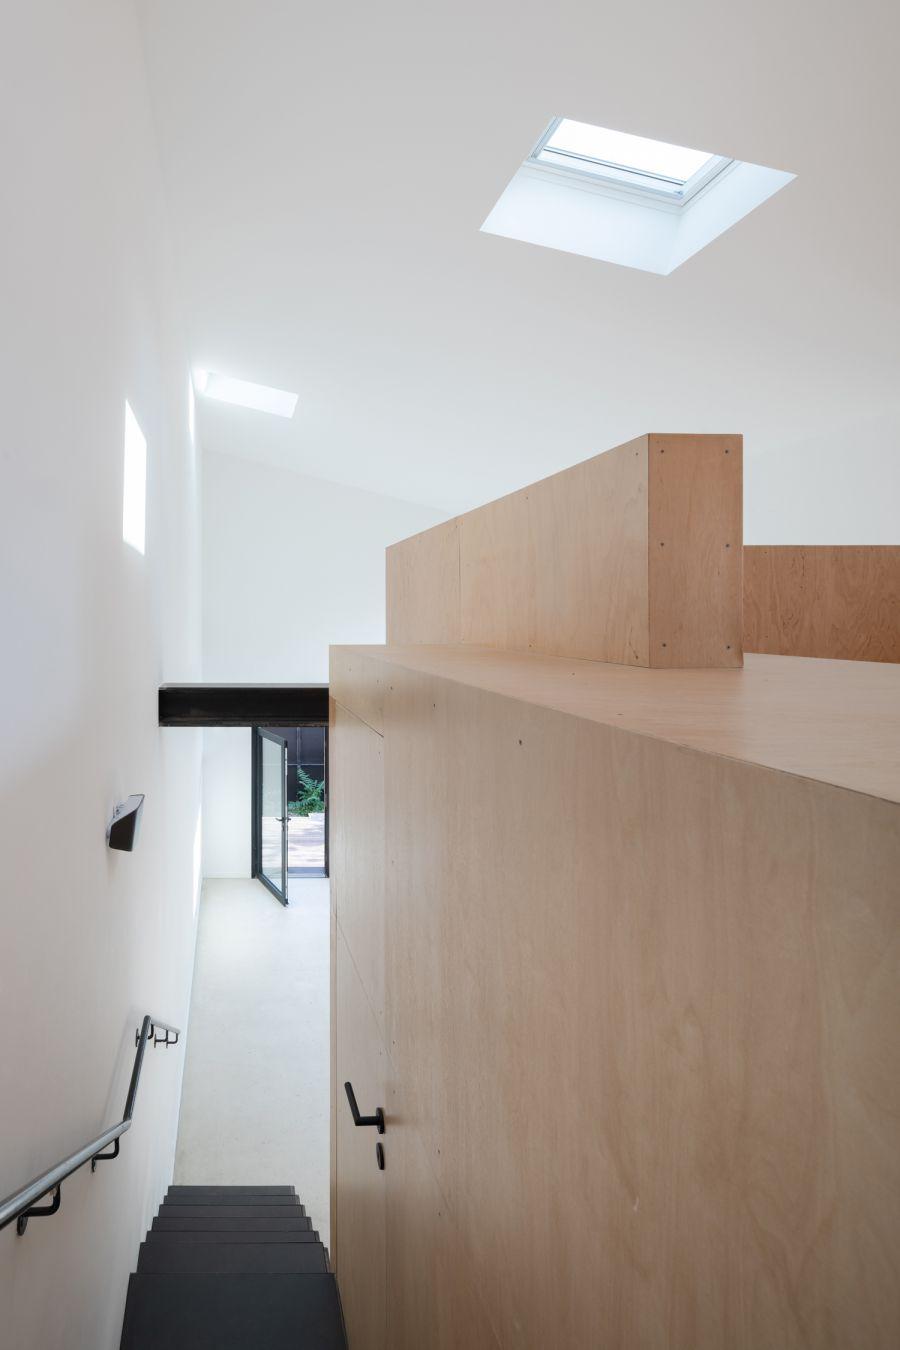 Montre-Oeuil - Arch. Atelier Florence Gaudin - Photo : Pierre l'Excellent